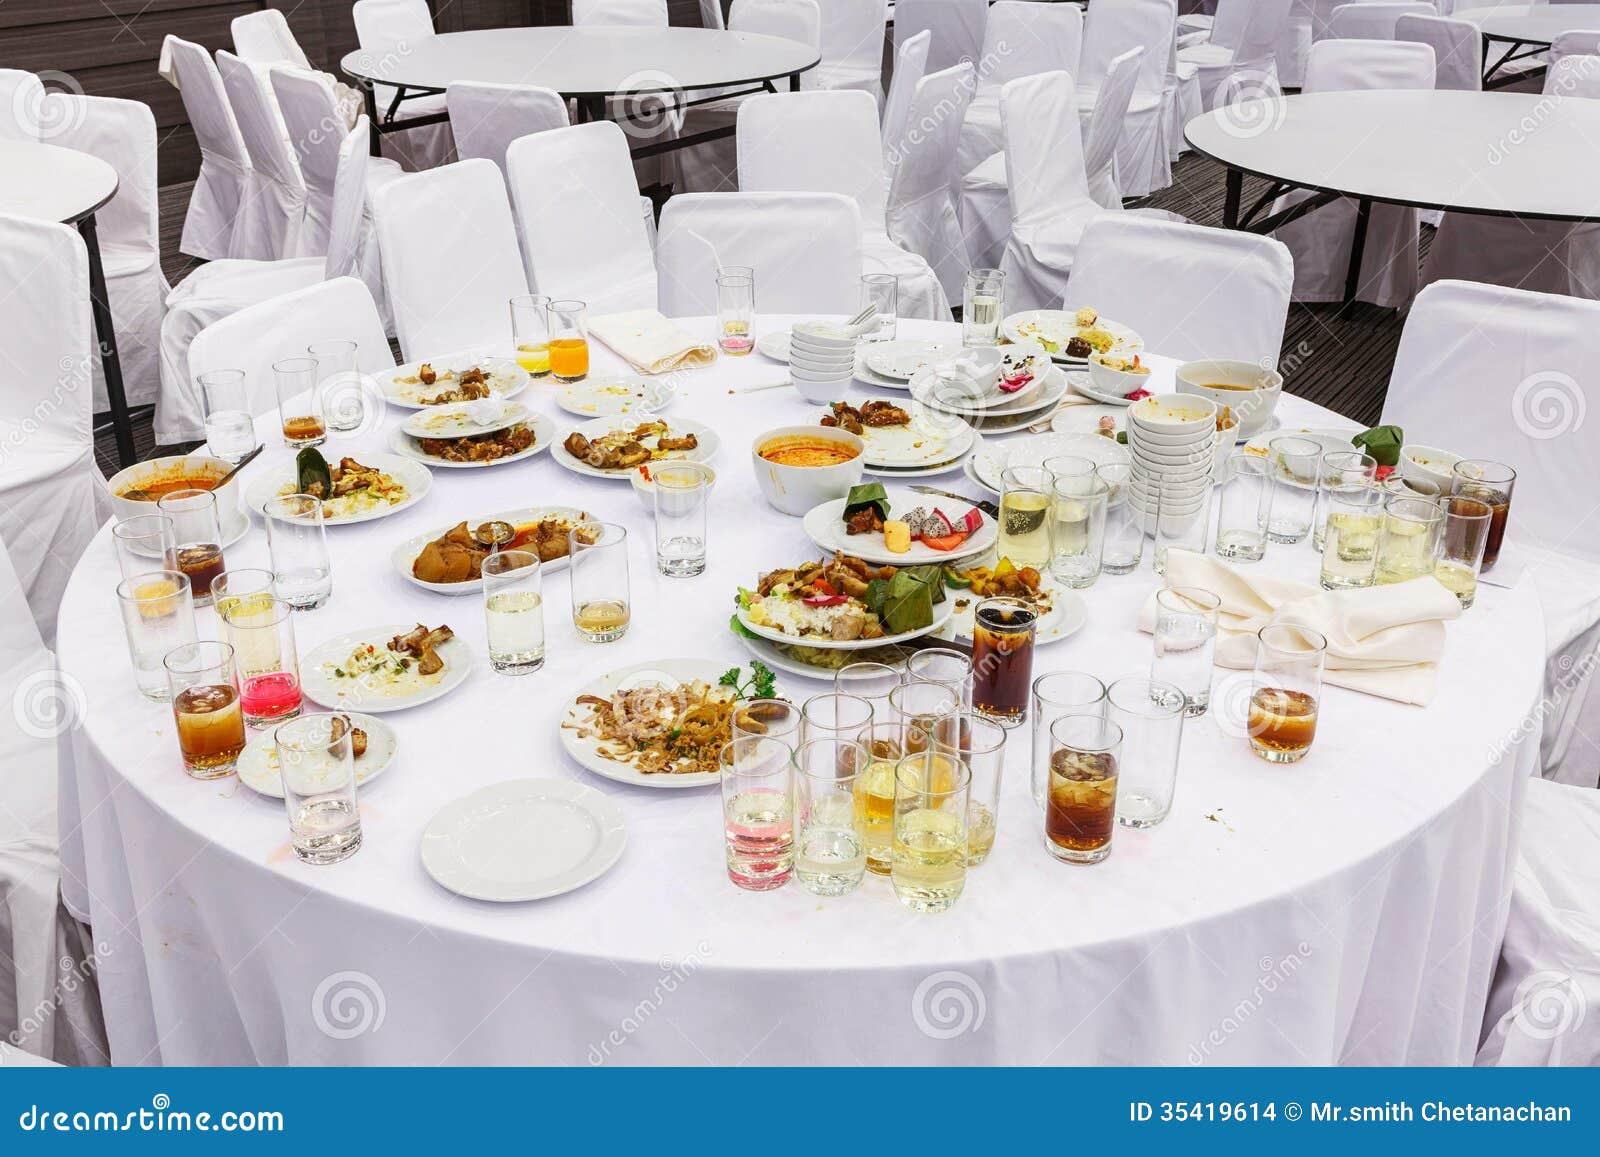 Waste food after dinner stock images image 35419614